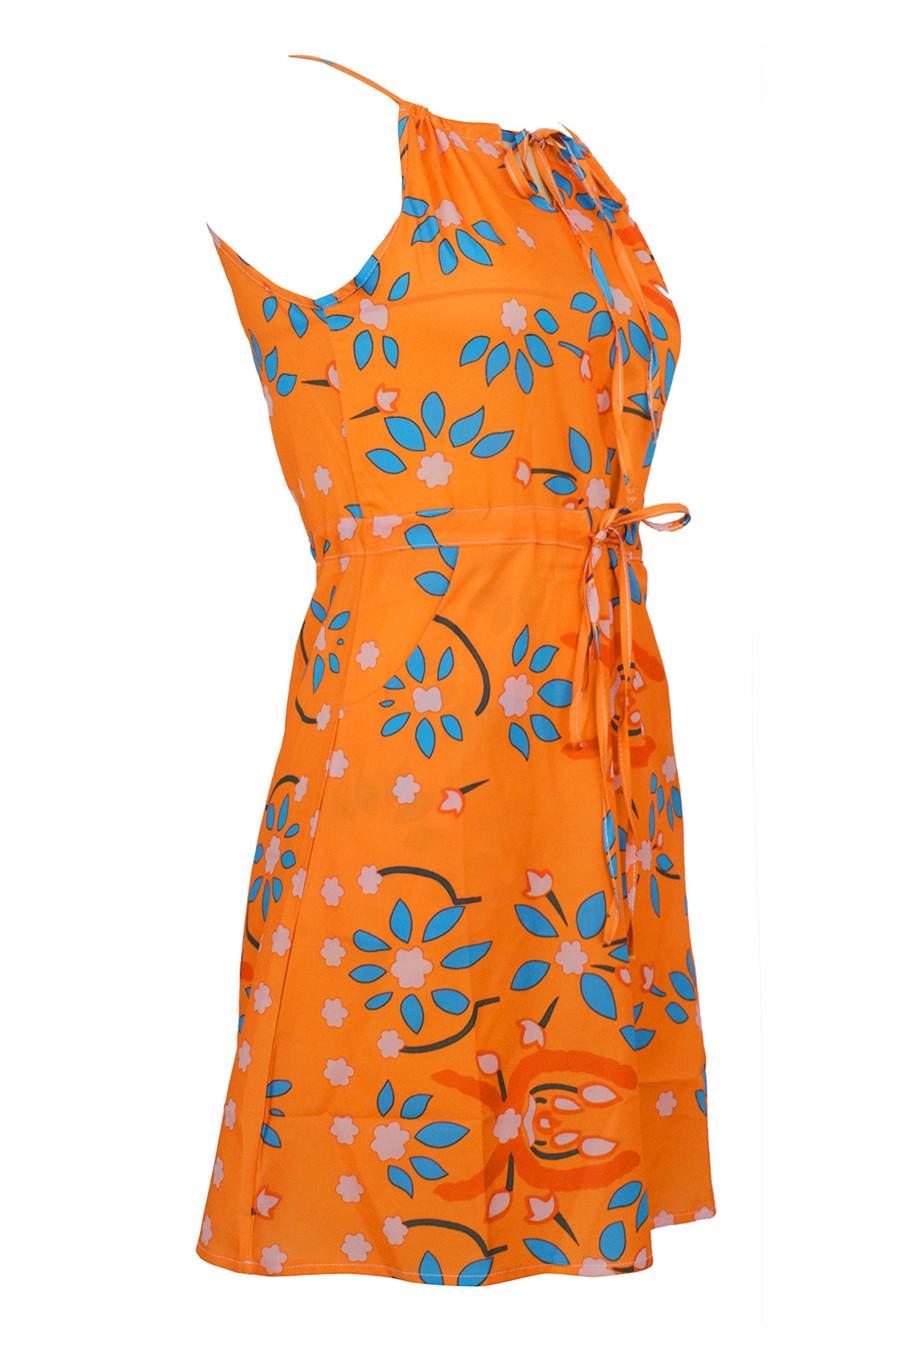 Gladiolus Chiffon Women Summer Dress Spaghetti Strap Floral Print Pocket Sexy Bohemian Beach Dress 2019 Short Ladies Dresses (18)